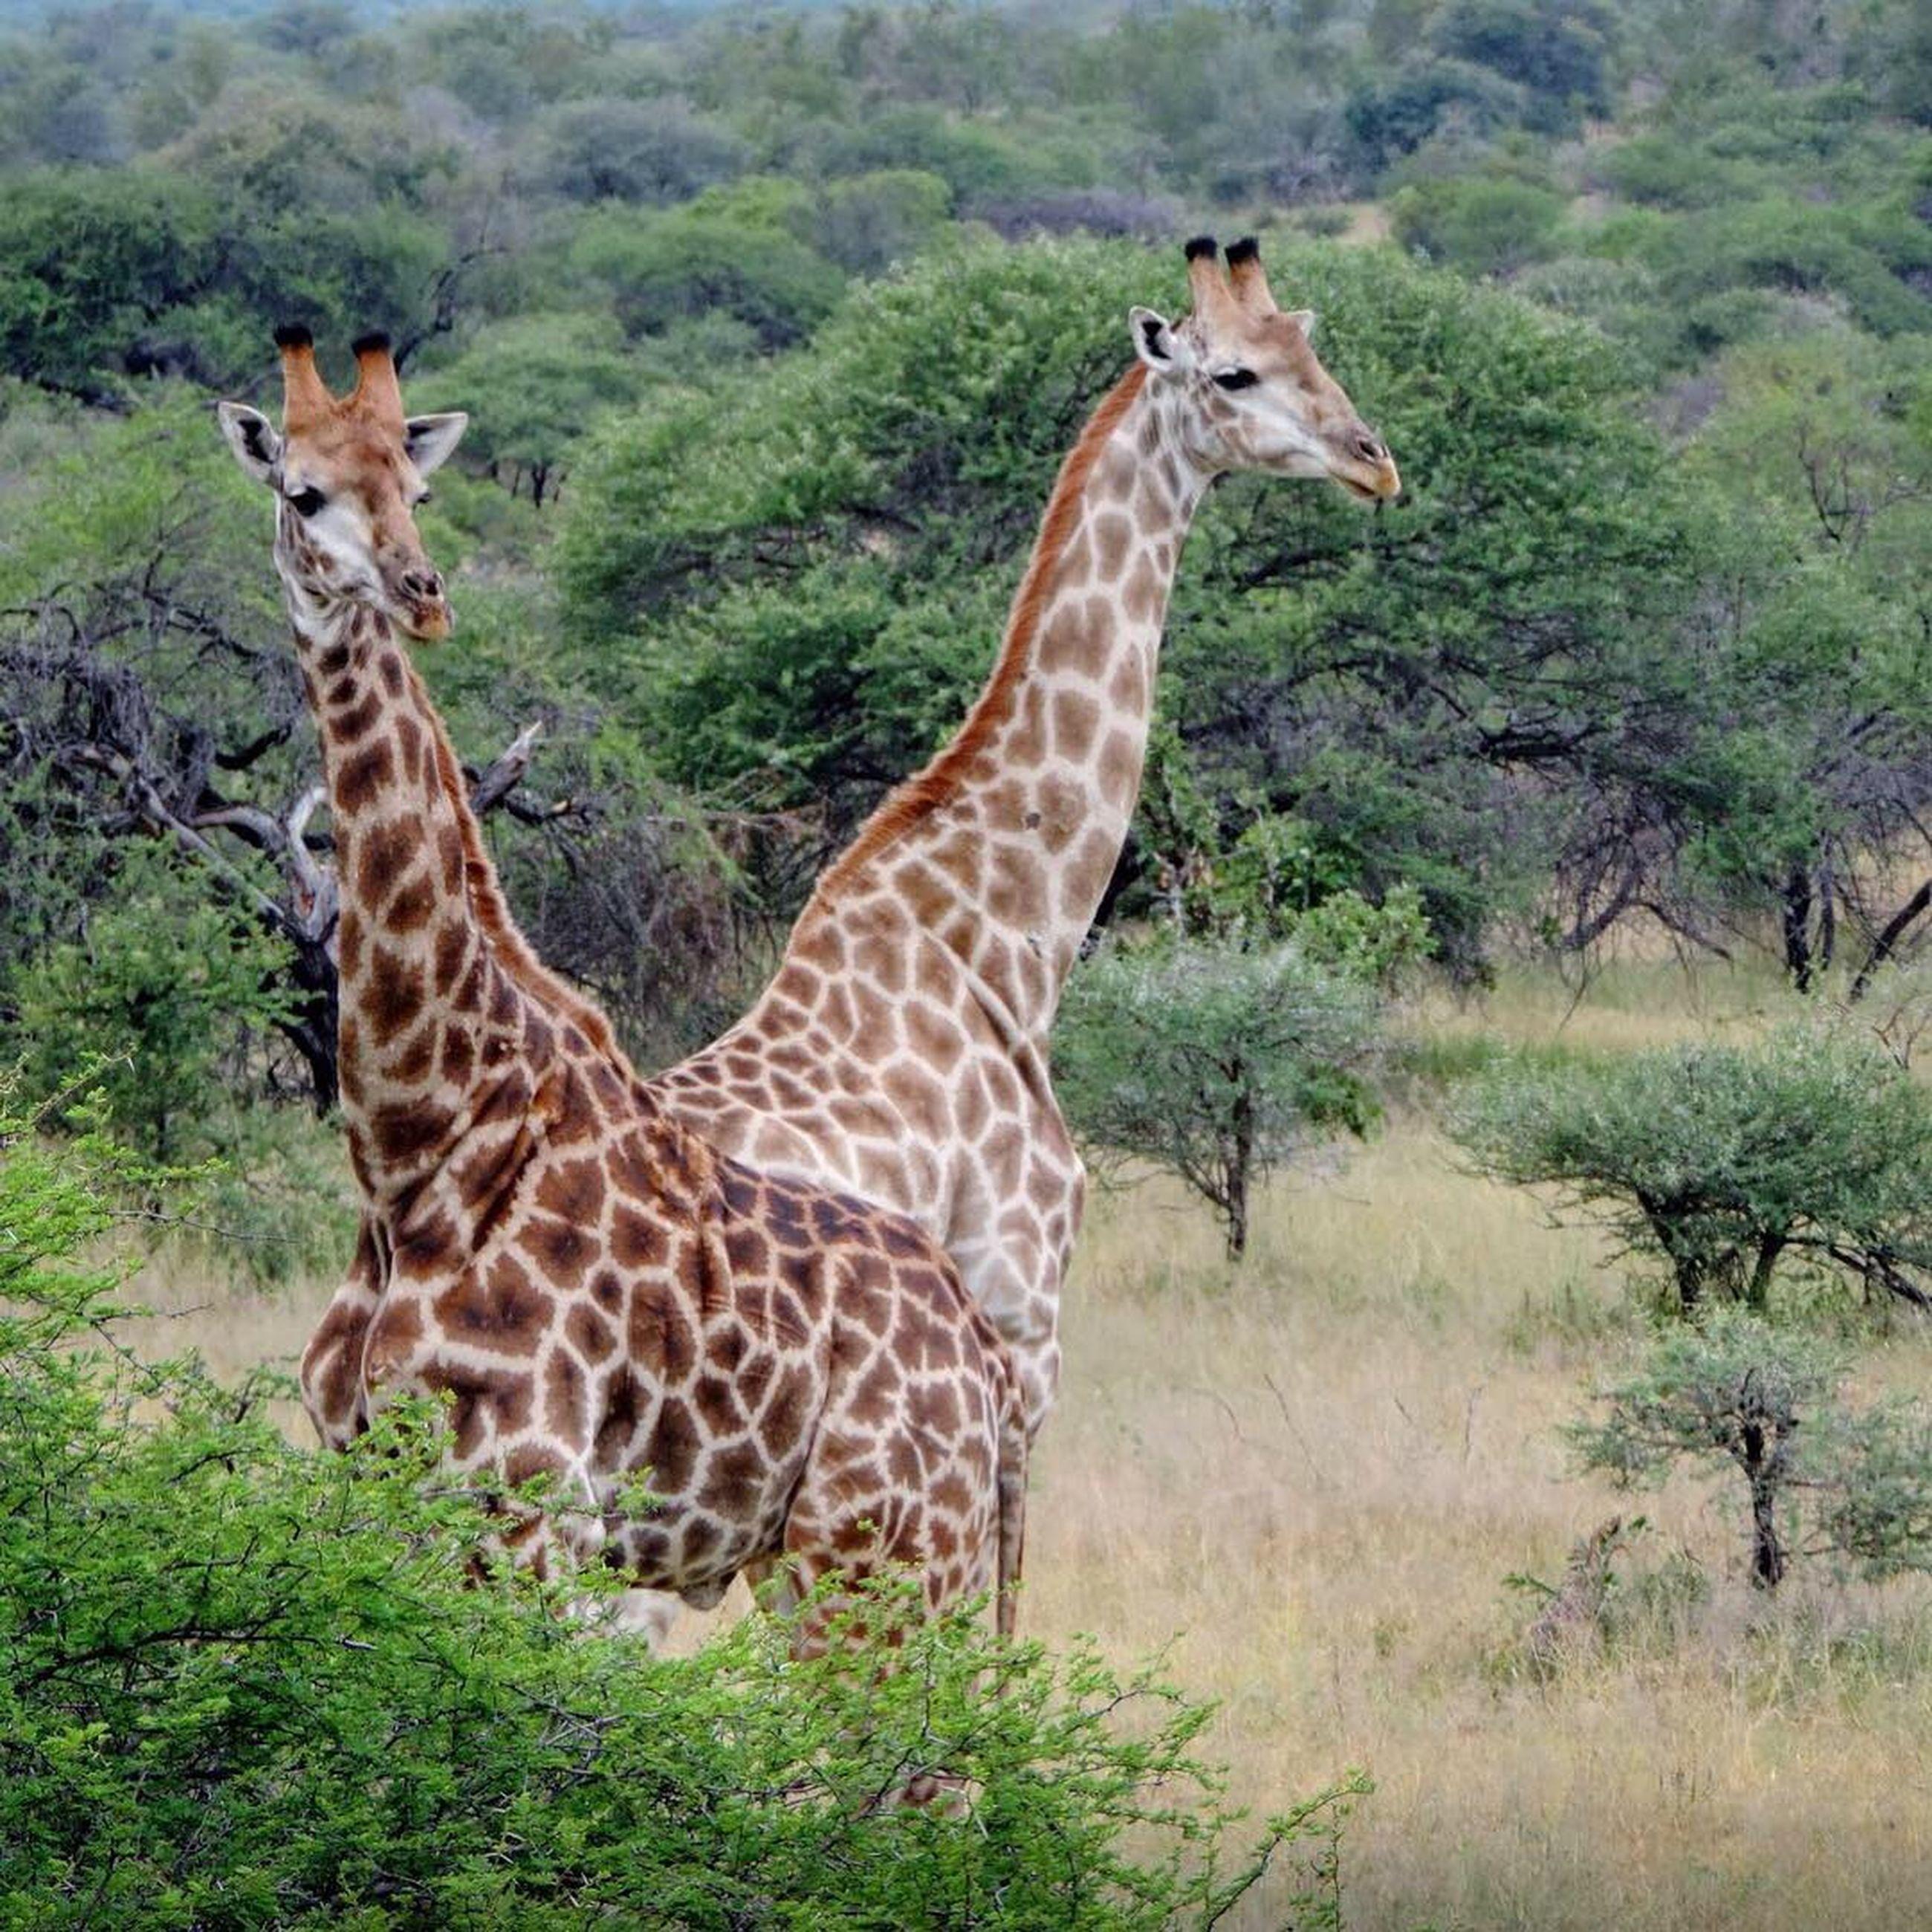 animal, animal themes, animals in the wild, animal wildlife, mammal, safari, giraffe, nature, grass, land, plant, vertebrate, no people, group of animals, day, focus on foreground, field, tree, outdoors, herbivorous, animal neck